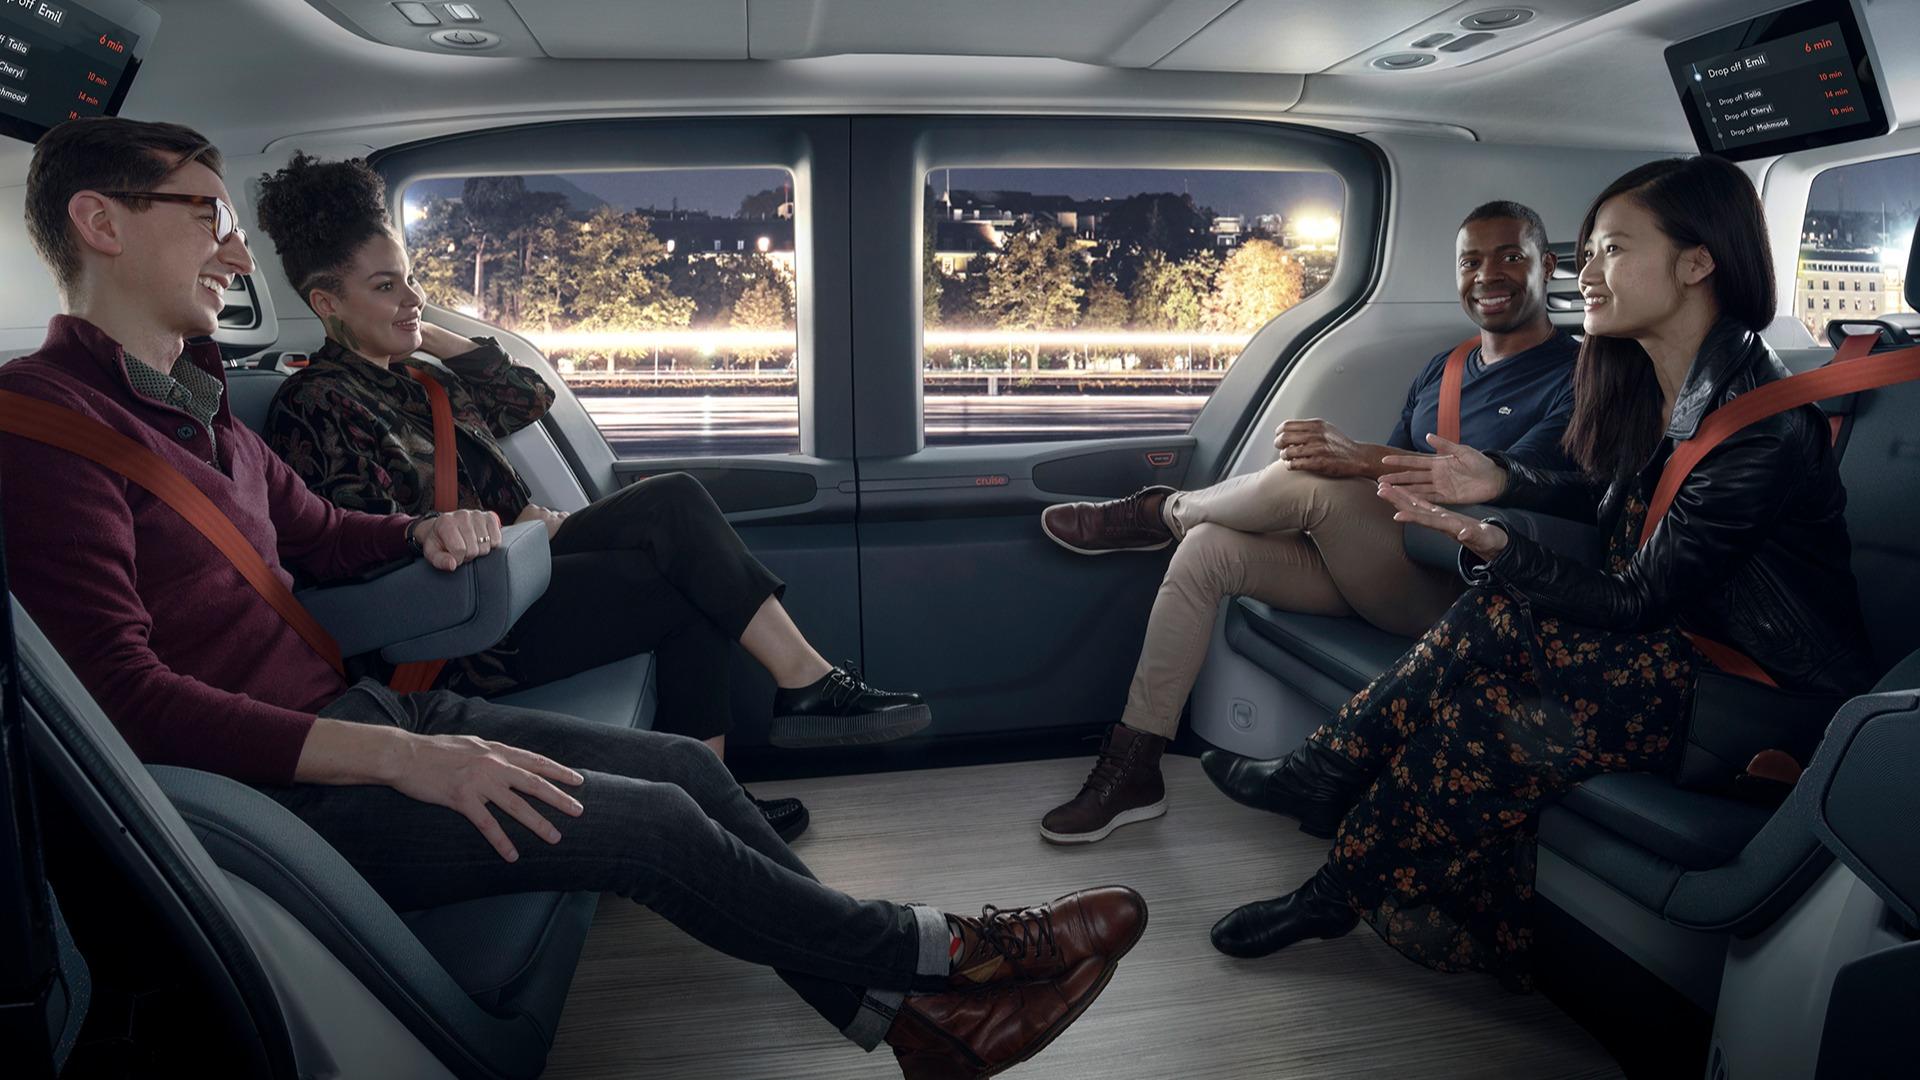 Cruise首款无人驾驶汽车落地 通用的转型焦虑有救了吗?